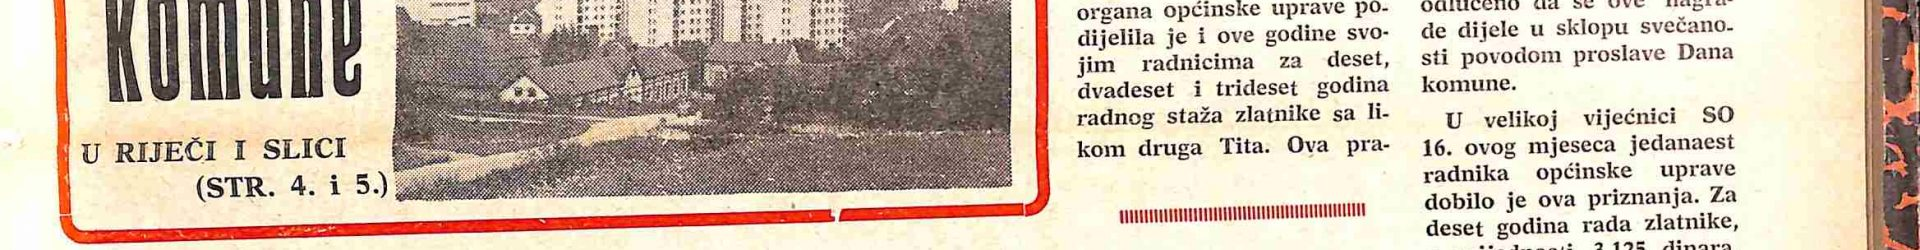 01 listopada 1980